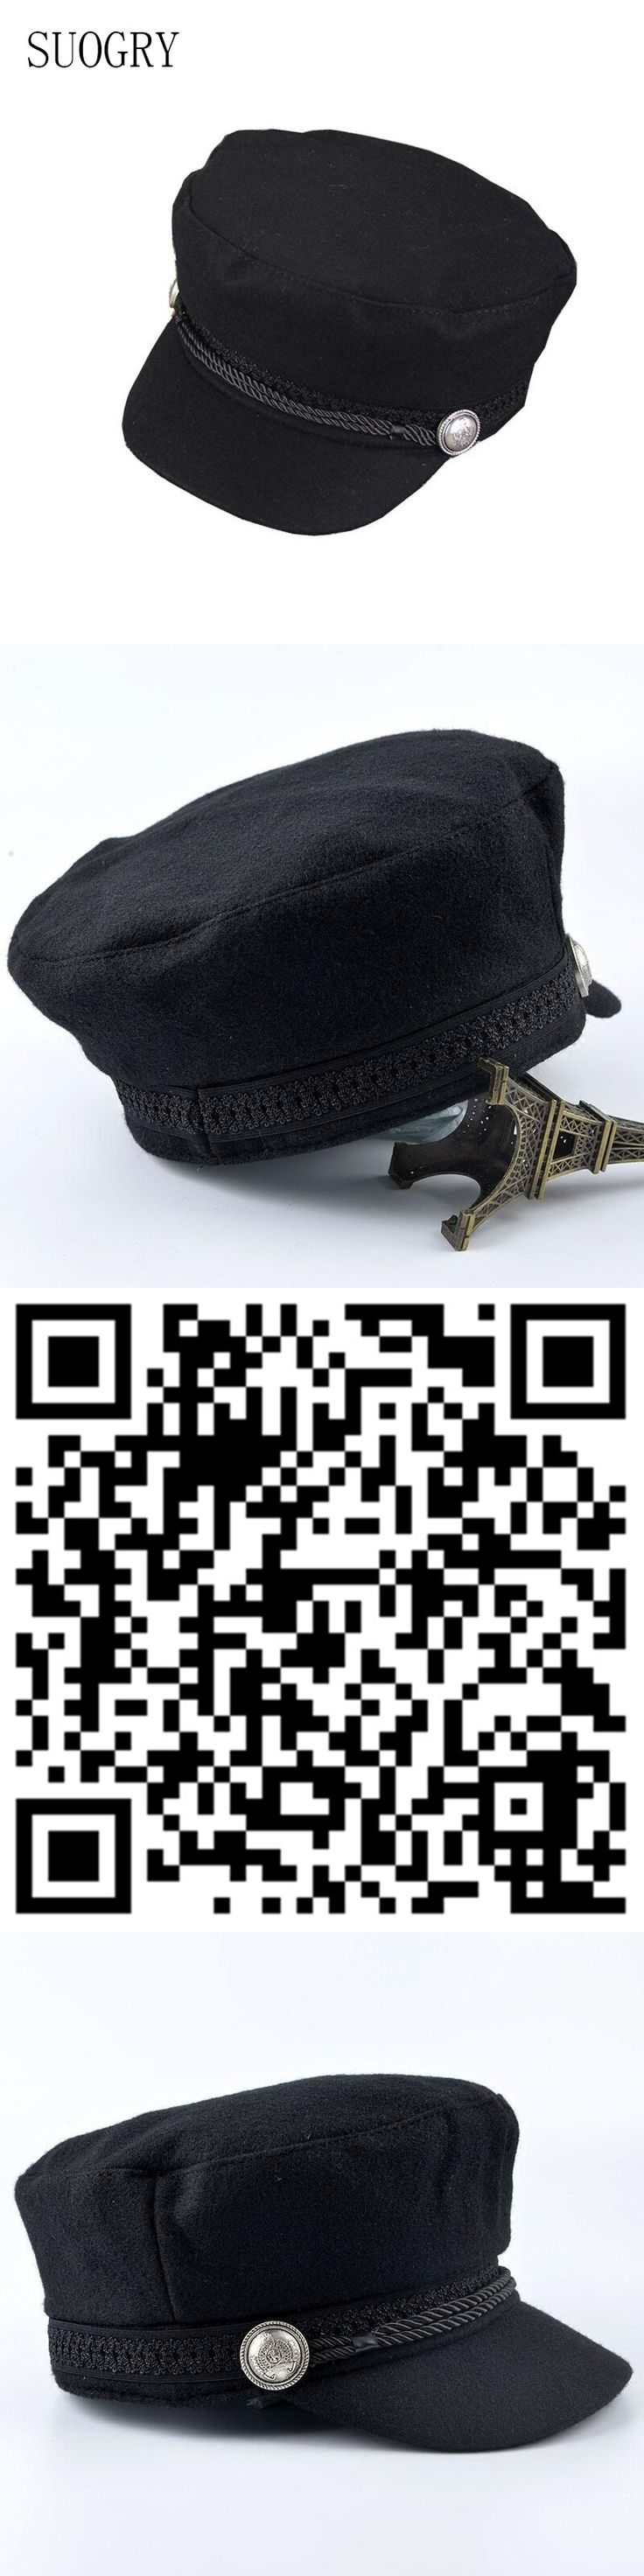 SUOGRY Winter Hats For Women Men Octagonal Cap Wool Button Baseball Caps Sun Visor Hat Gorras Casquette Touca Black Casual